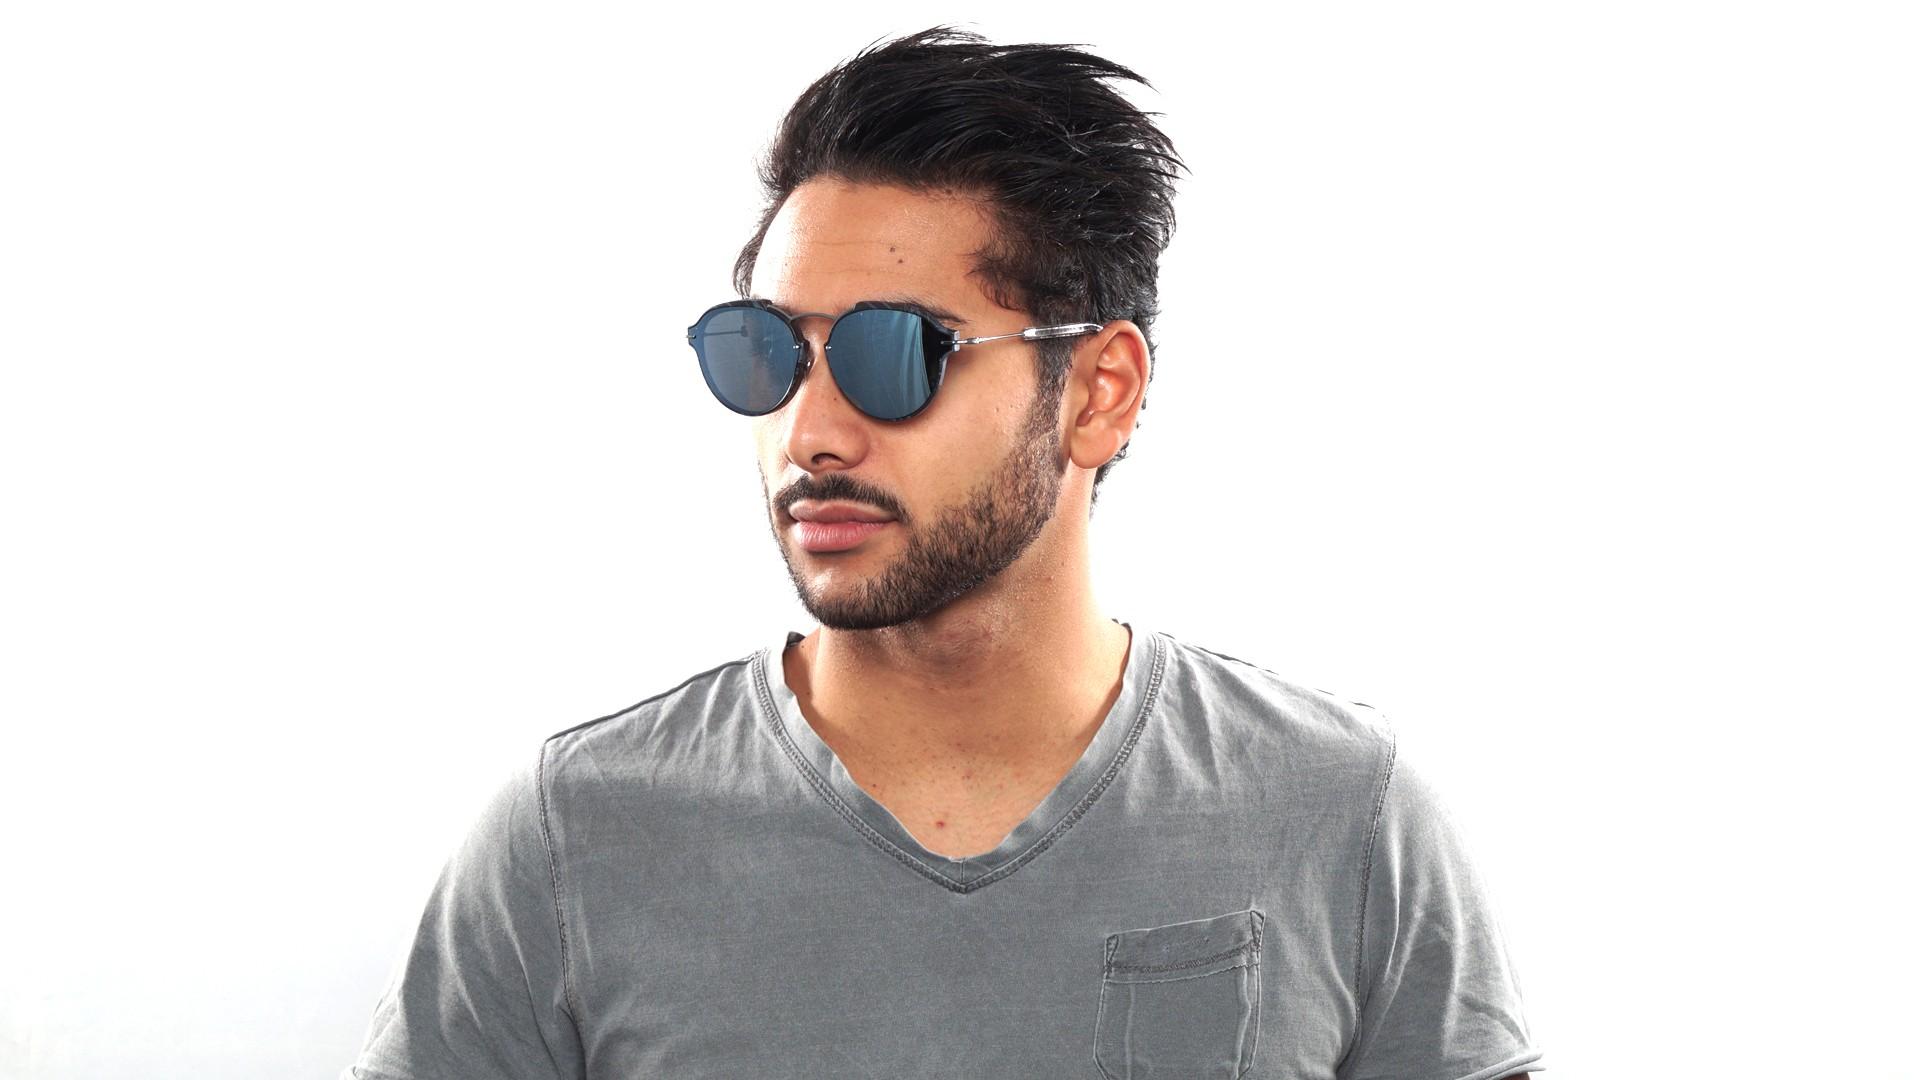 38bf1ec77bfe1 Sunglasses Dior Eclat Grey Matte ECLAT GNOT7 60-13 Medium Mirror